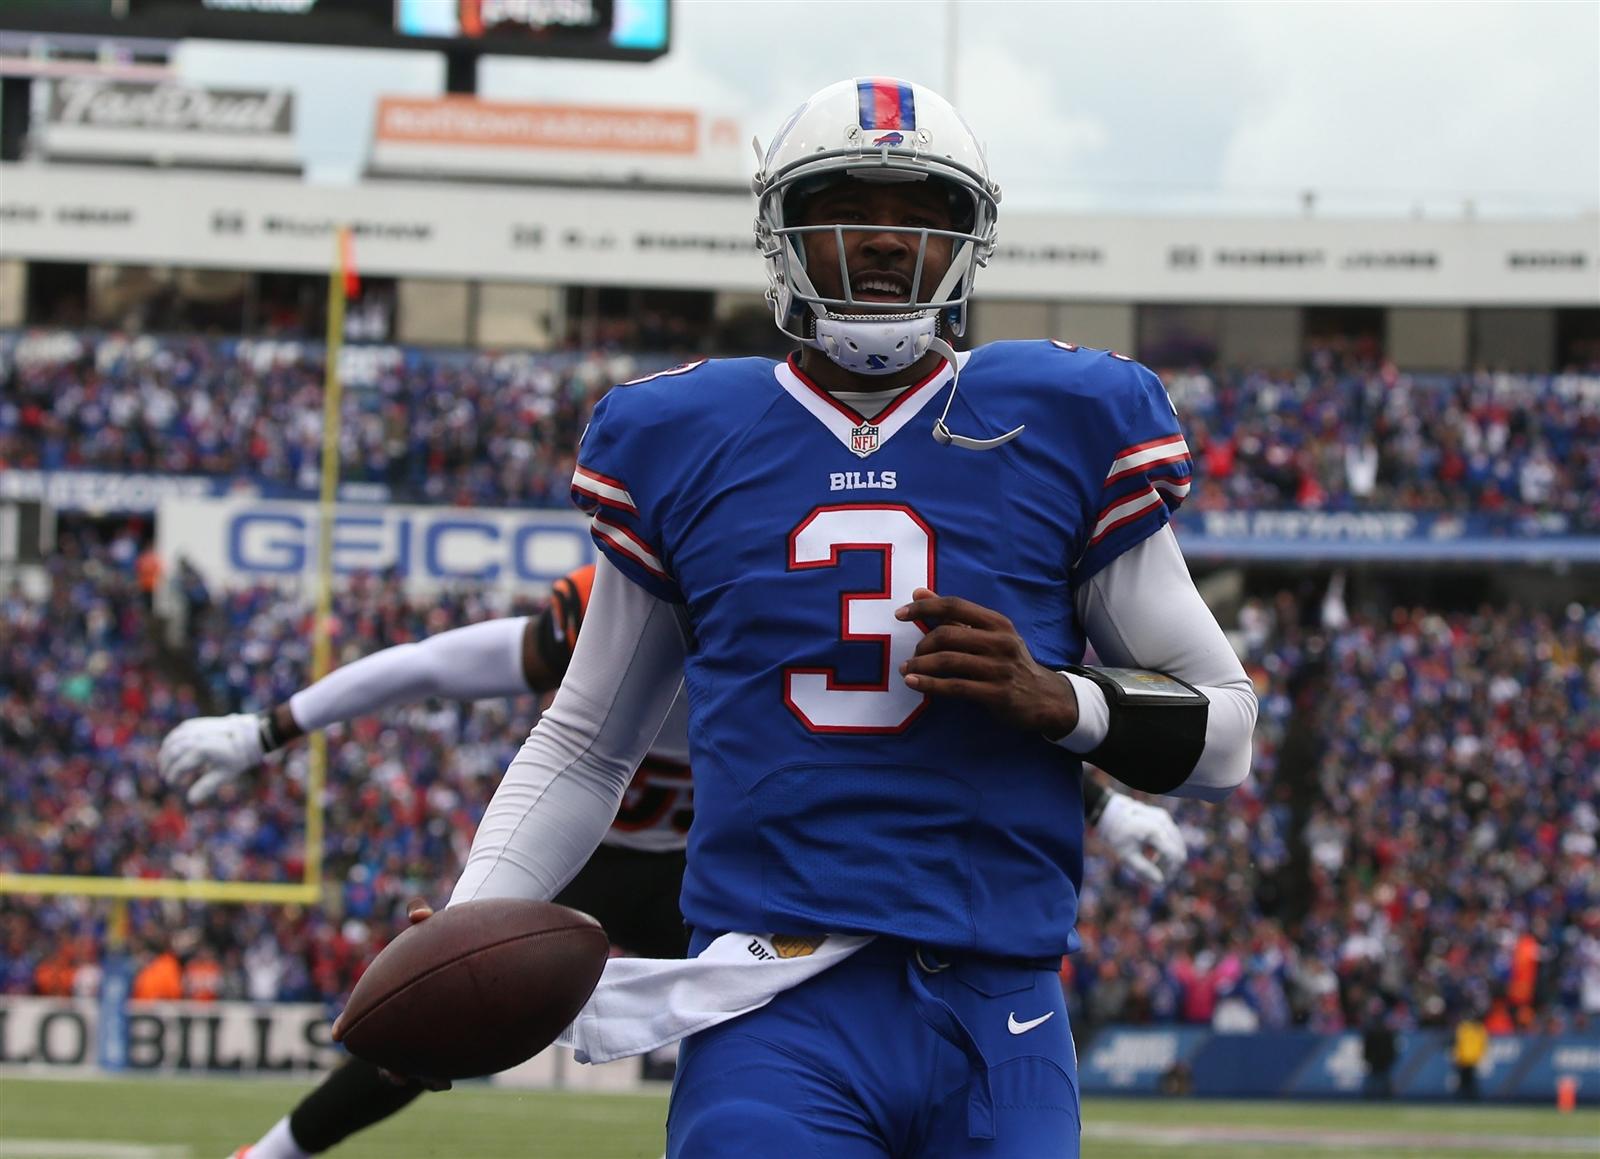 EJ Manuel scores a first-quarter touchdown. (James P. McCoy/Buffalo News)